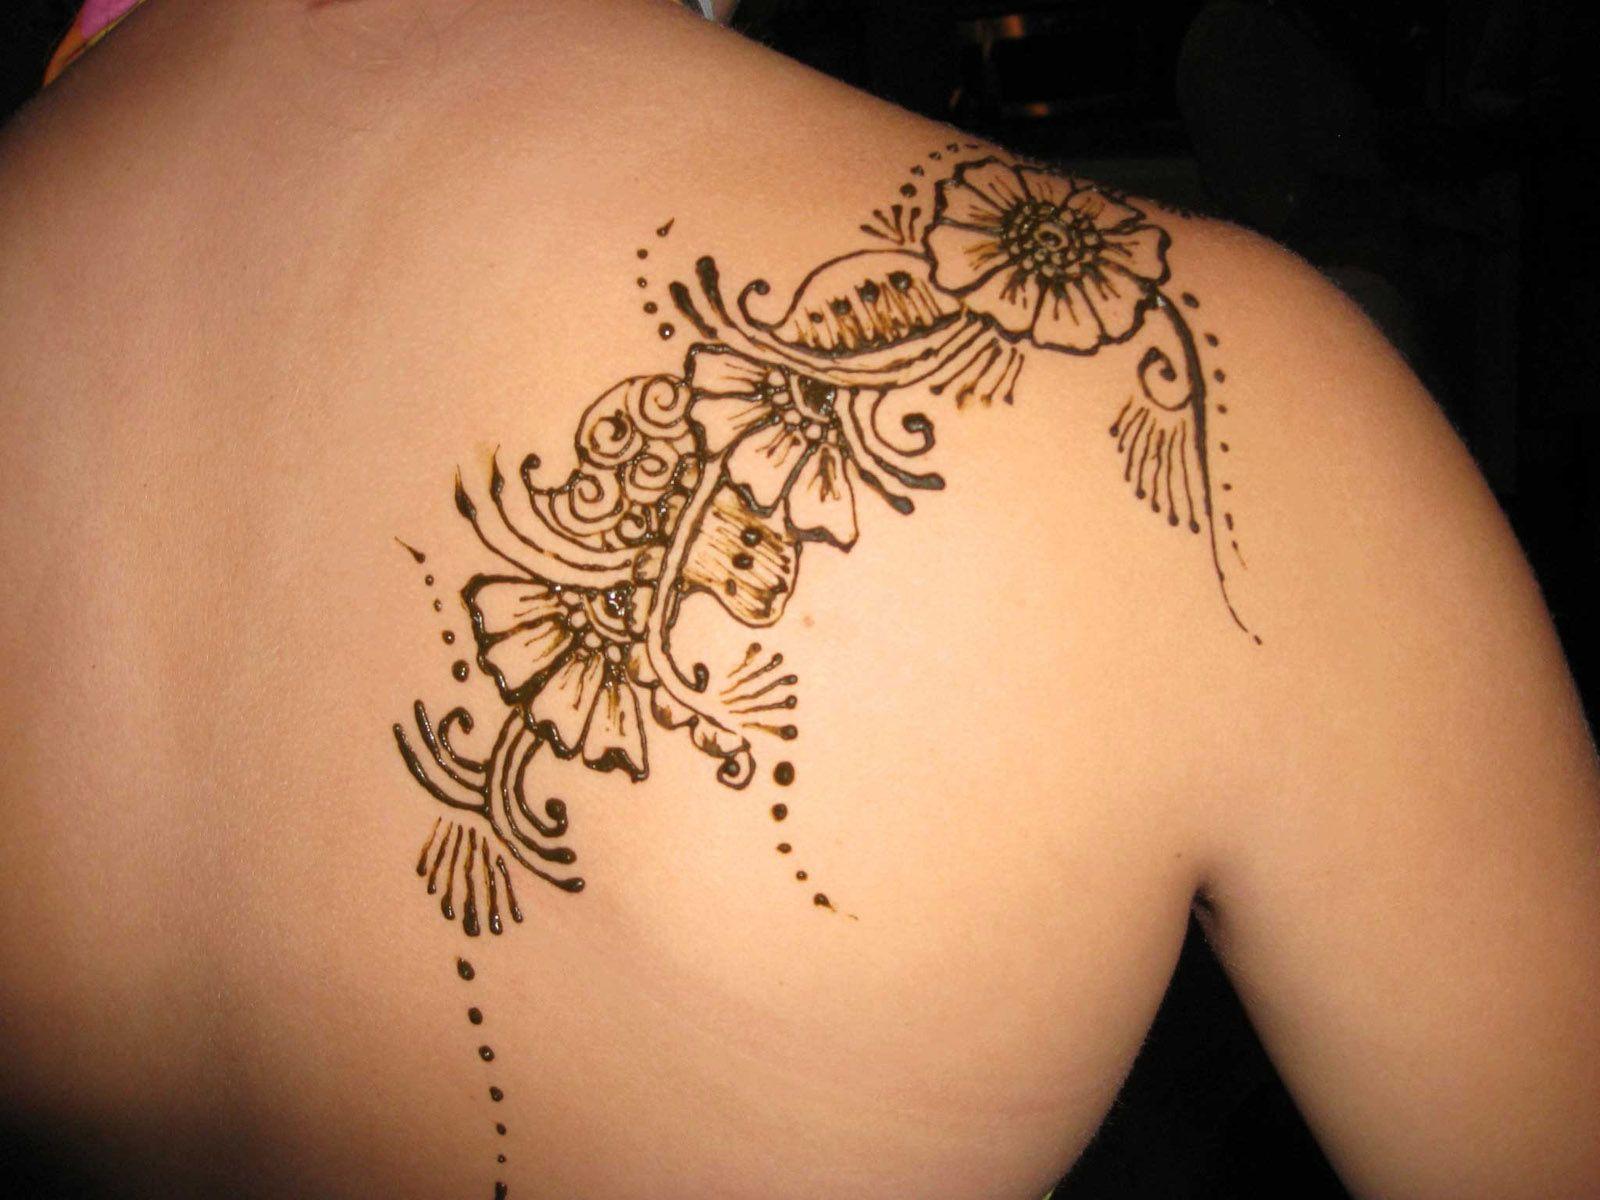 Marriege-Tattoo-Mehndi-Design-Wallpaper.jpg (1600×1200)